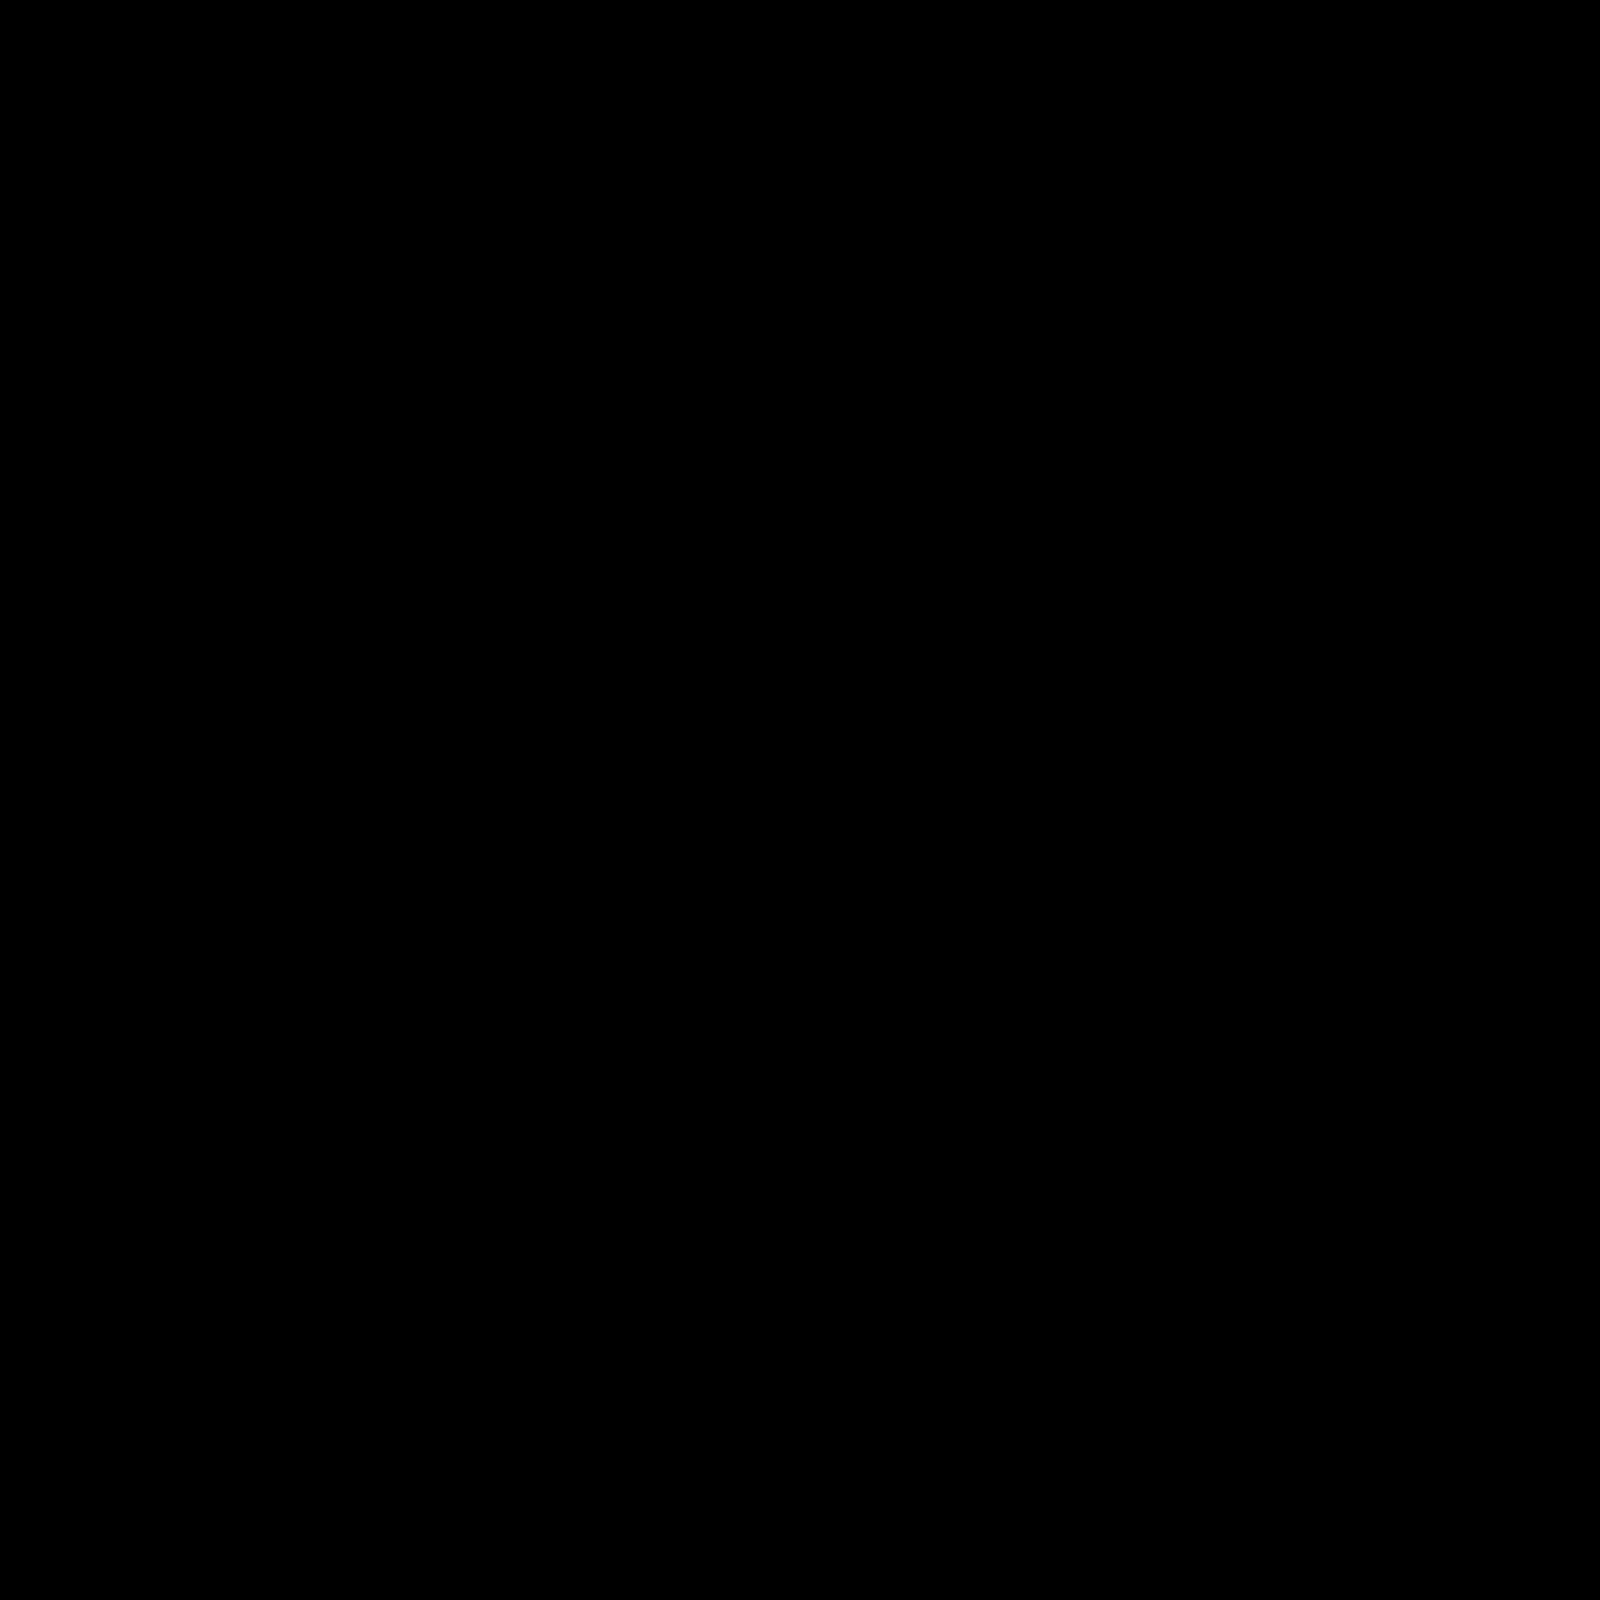 Спираль ДНК icon